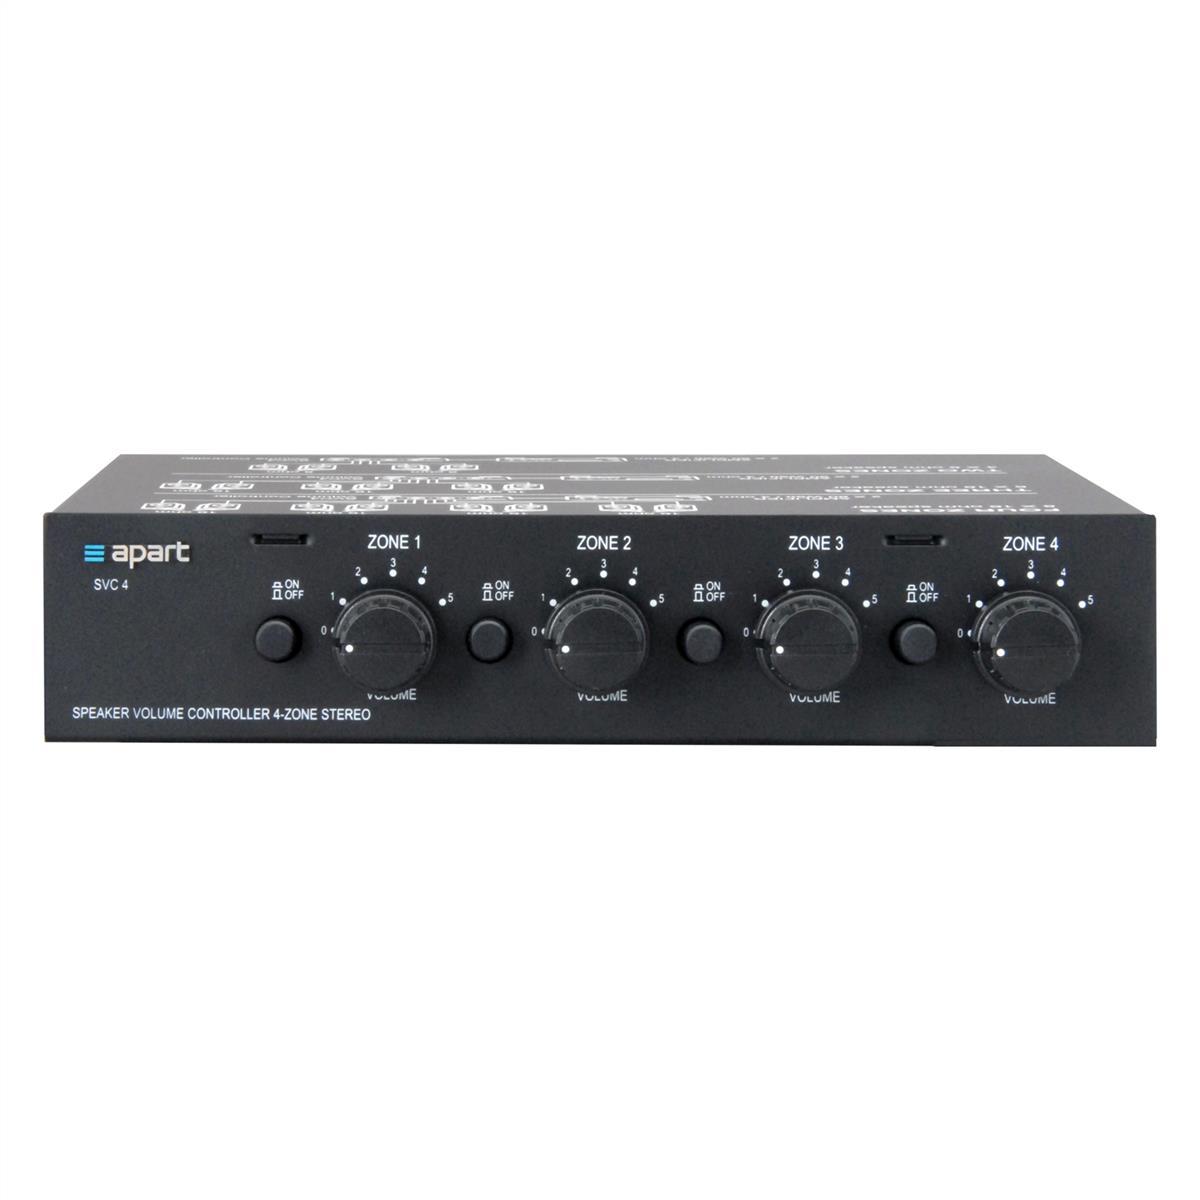 4-zone stereo volume control